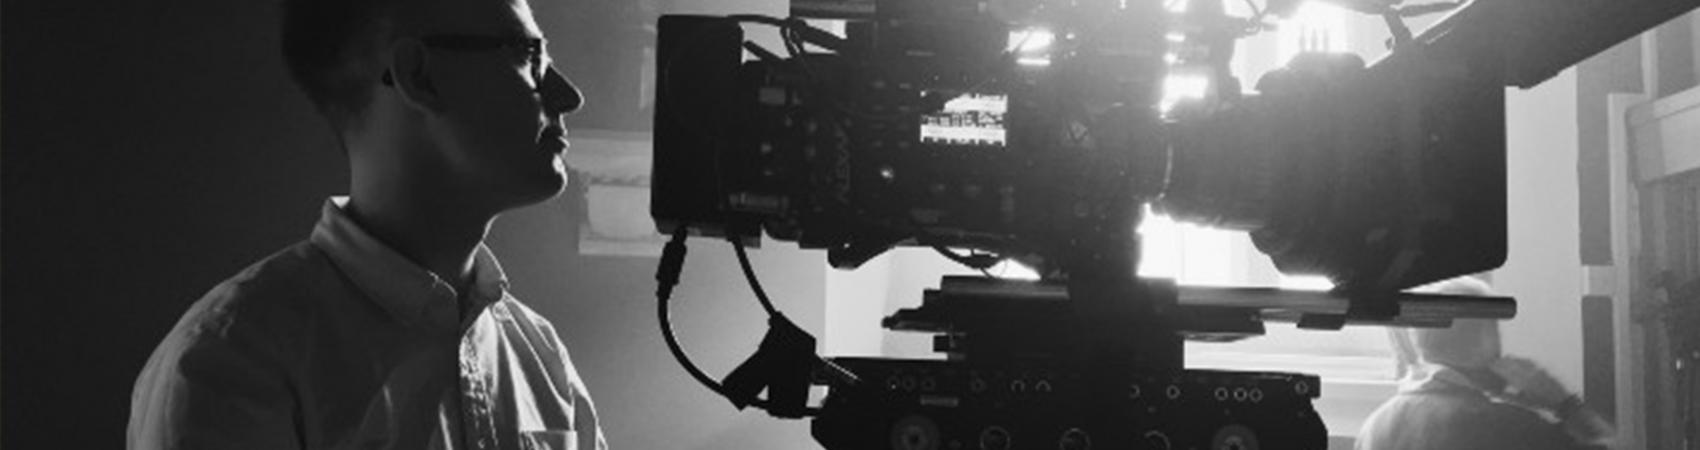 Capturing Light – Episode 61 (Monday Motivation)